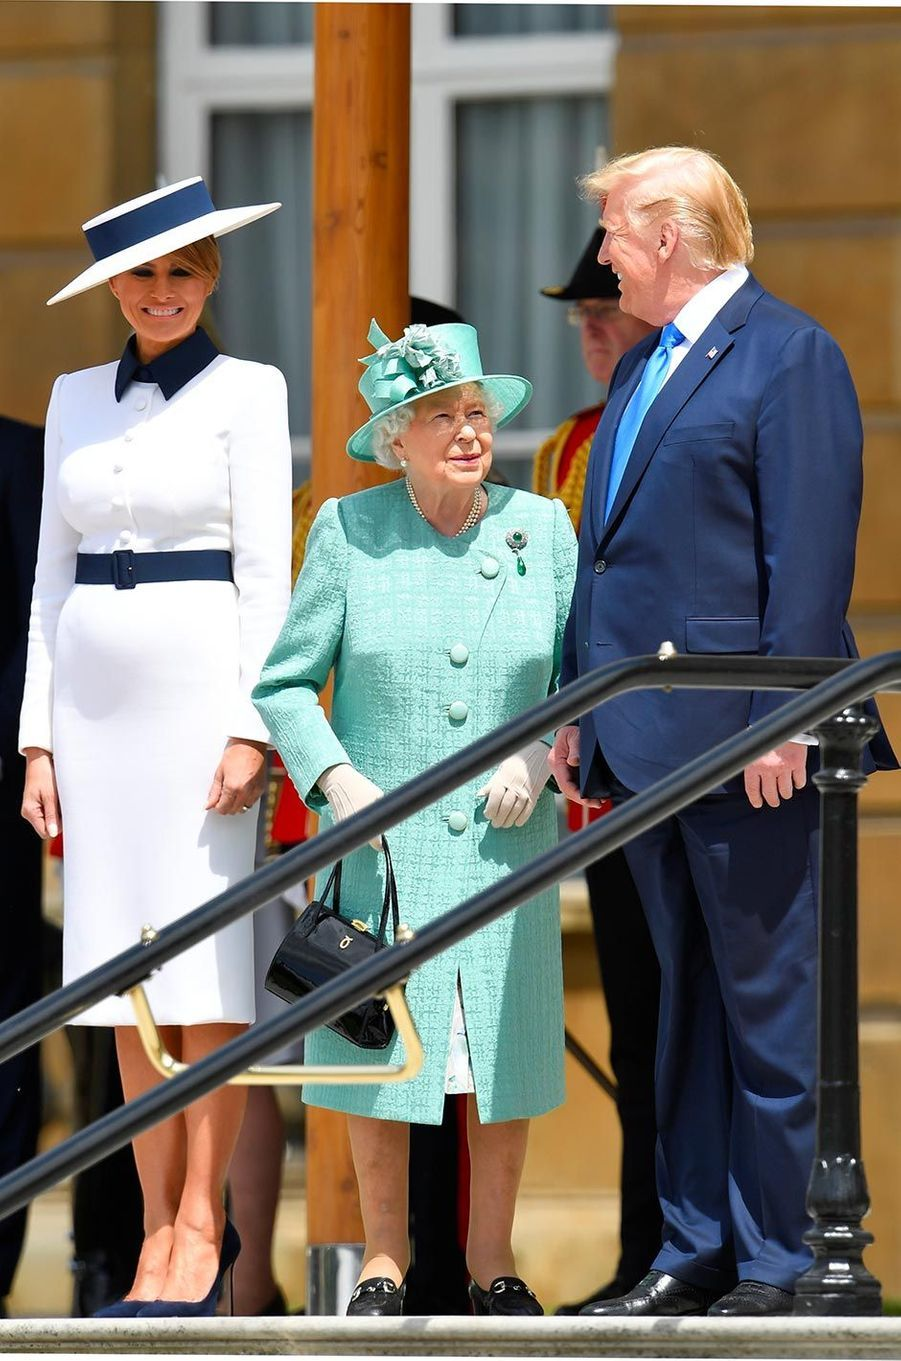 Melania Trump arrivant à Buckingham Palace, le 3 juin 2019.